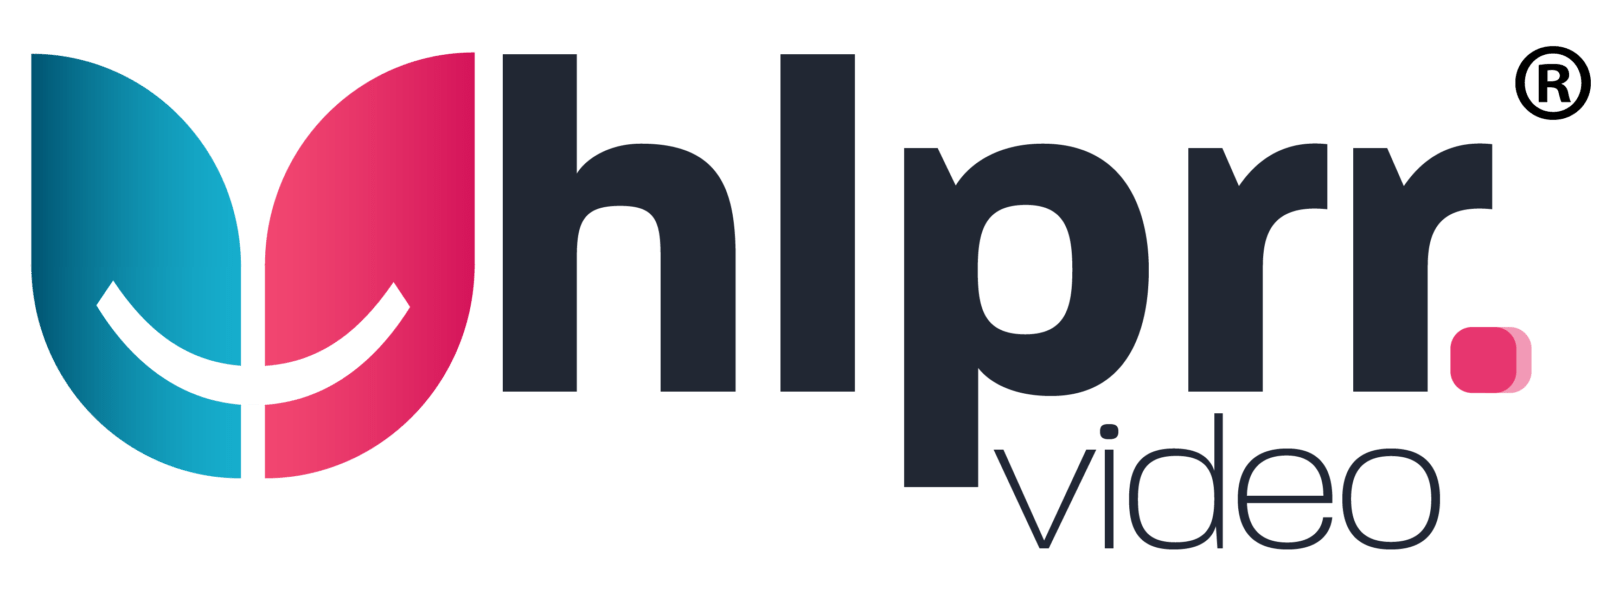 hlprr_video_logo_registered_trademark@288x